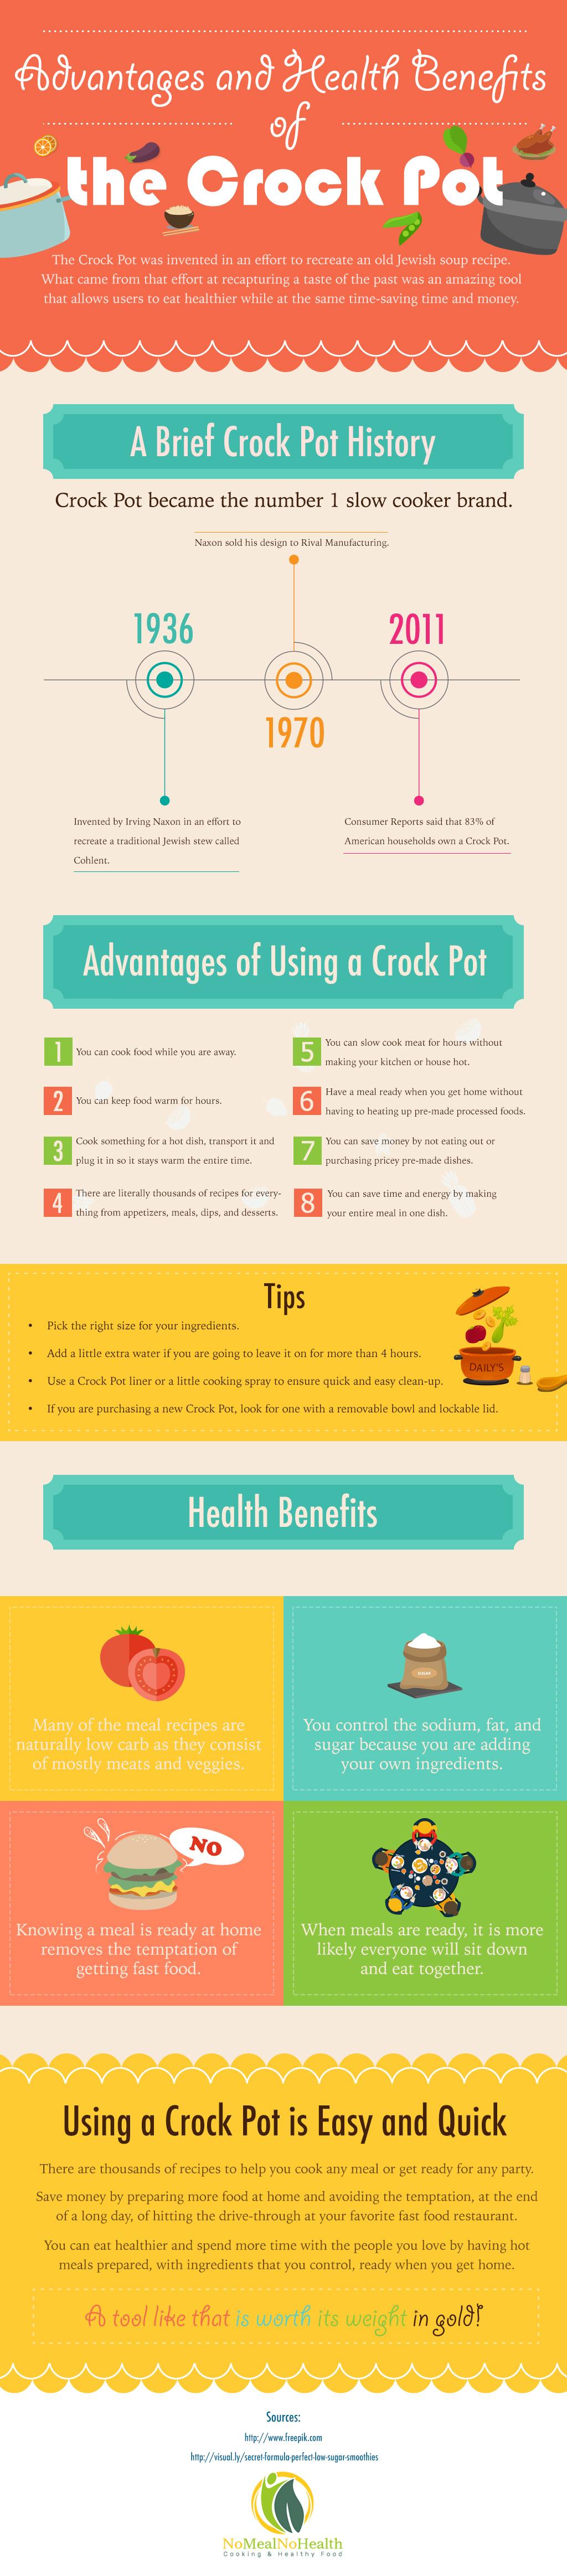 advantages and health benefits of the crock pot